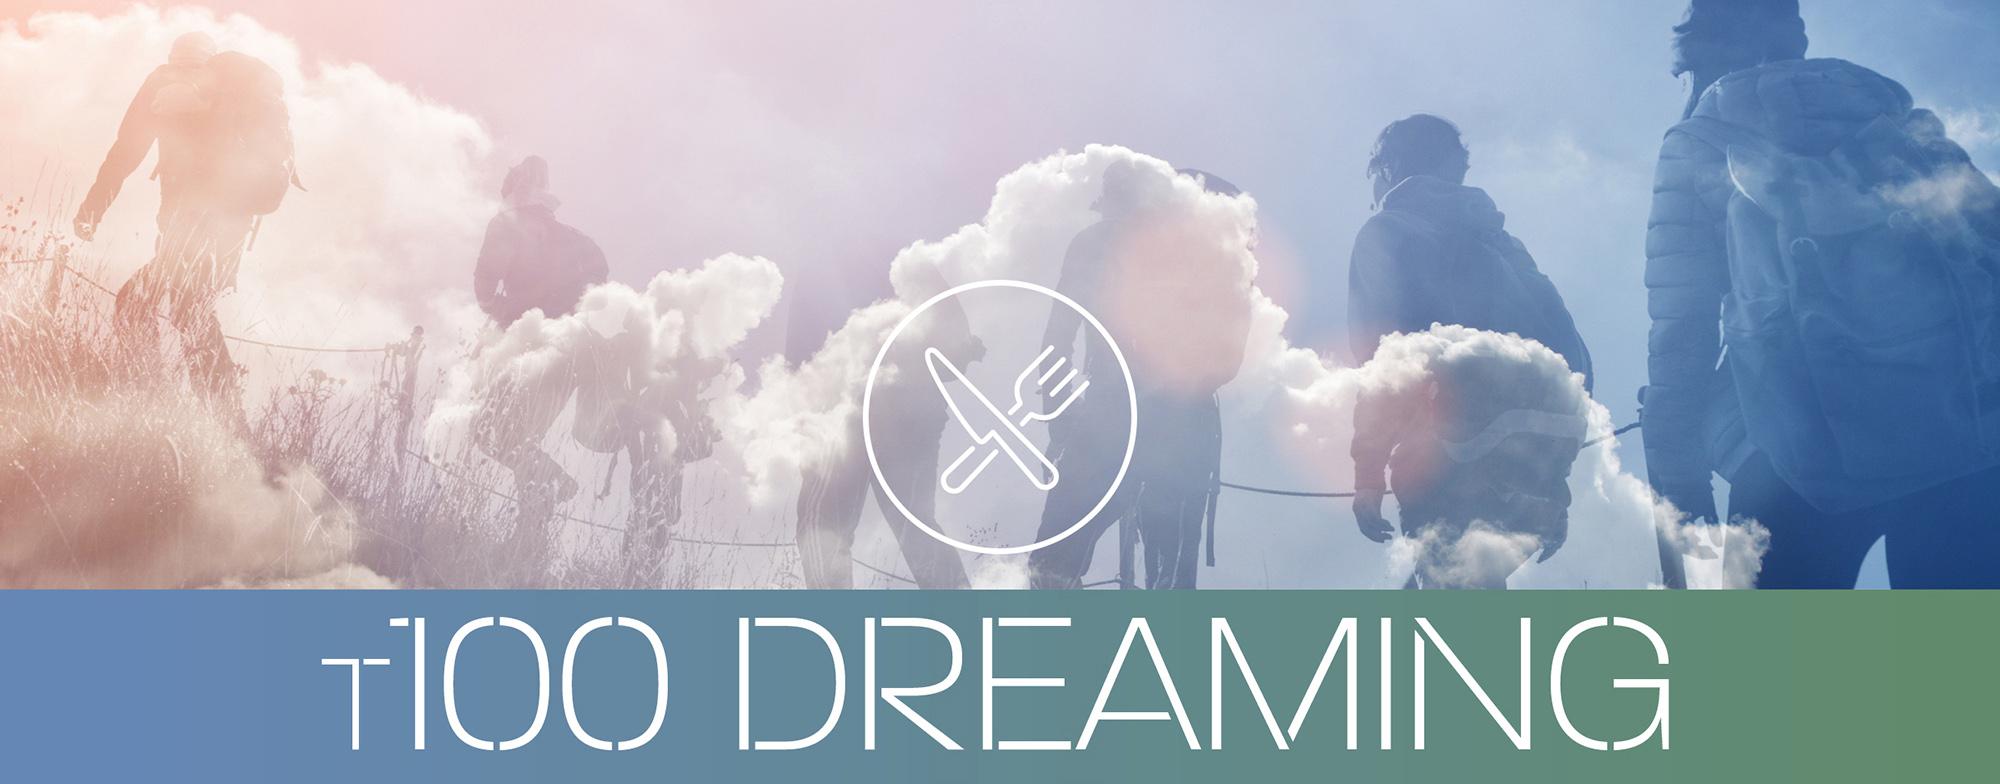 T100 Dreaming Grays walk header image